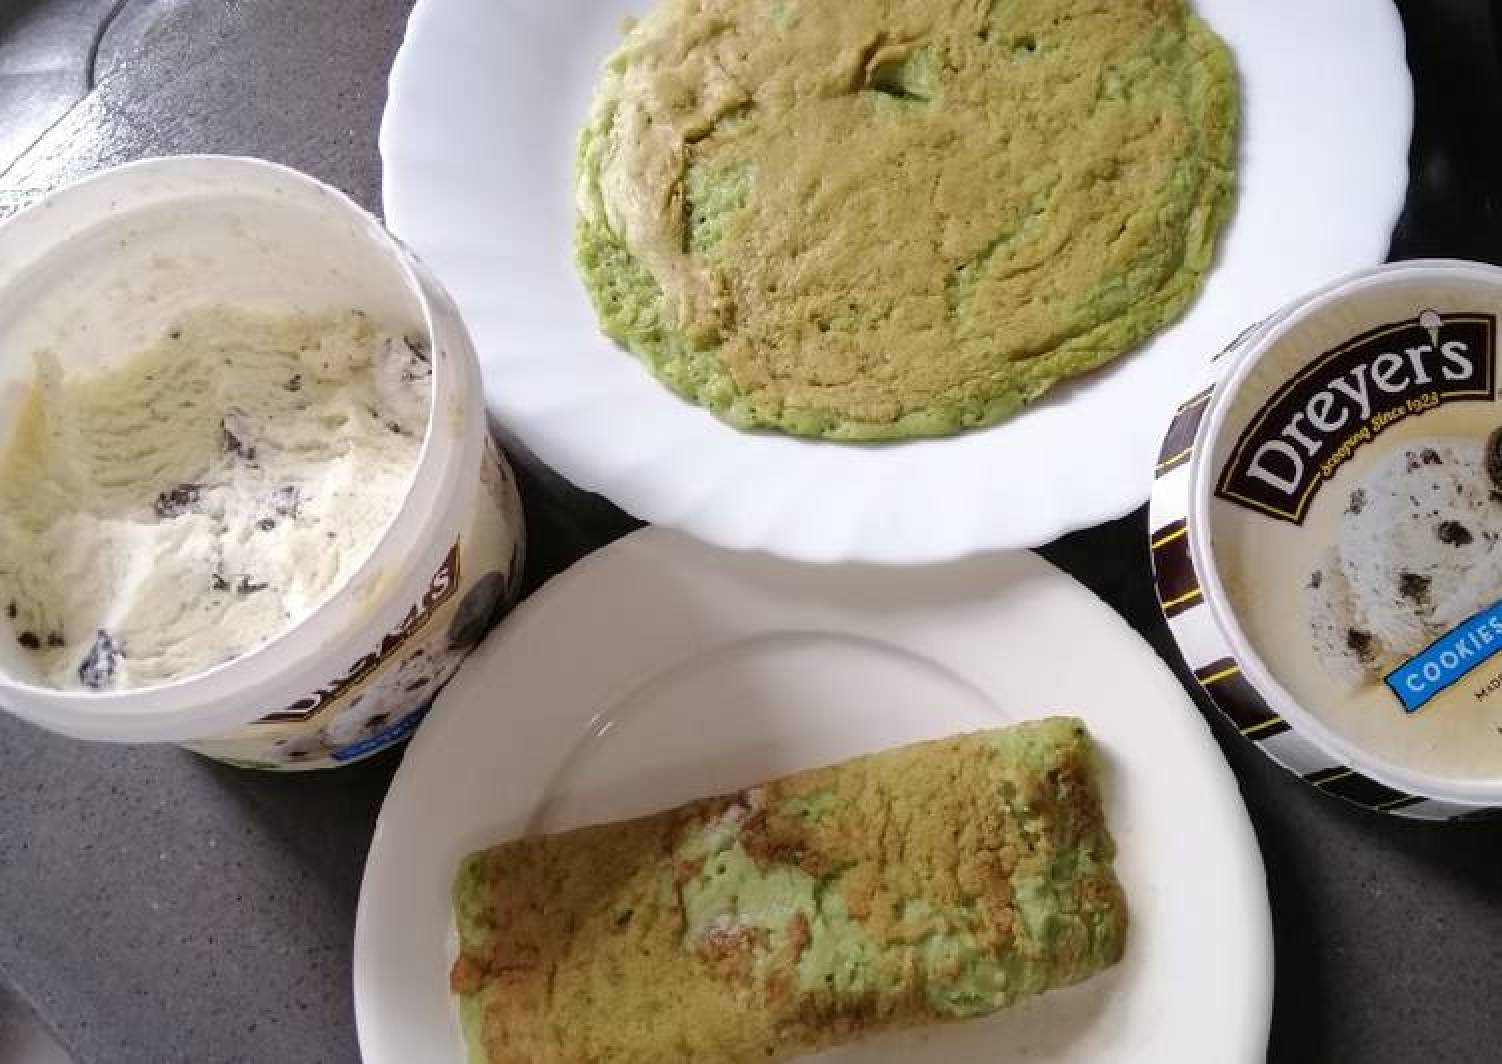 Rolled Ice Pancake w/ Ice Cream